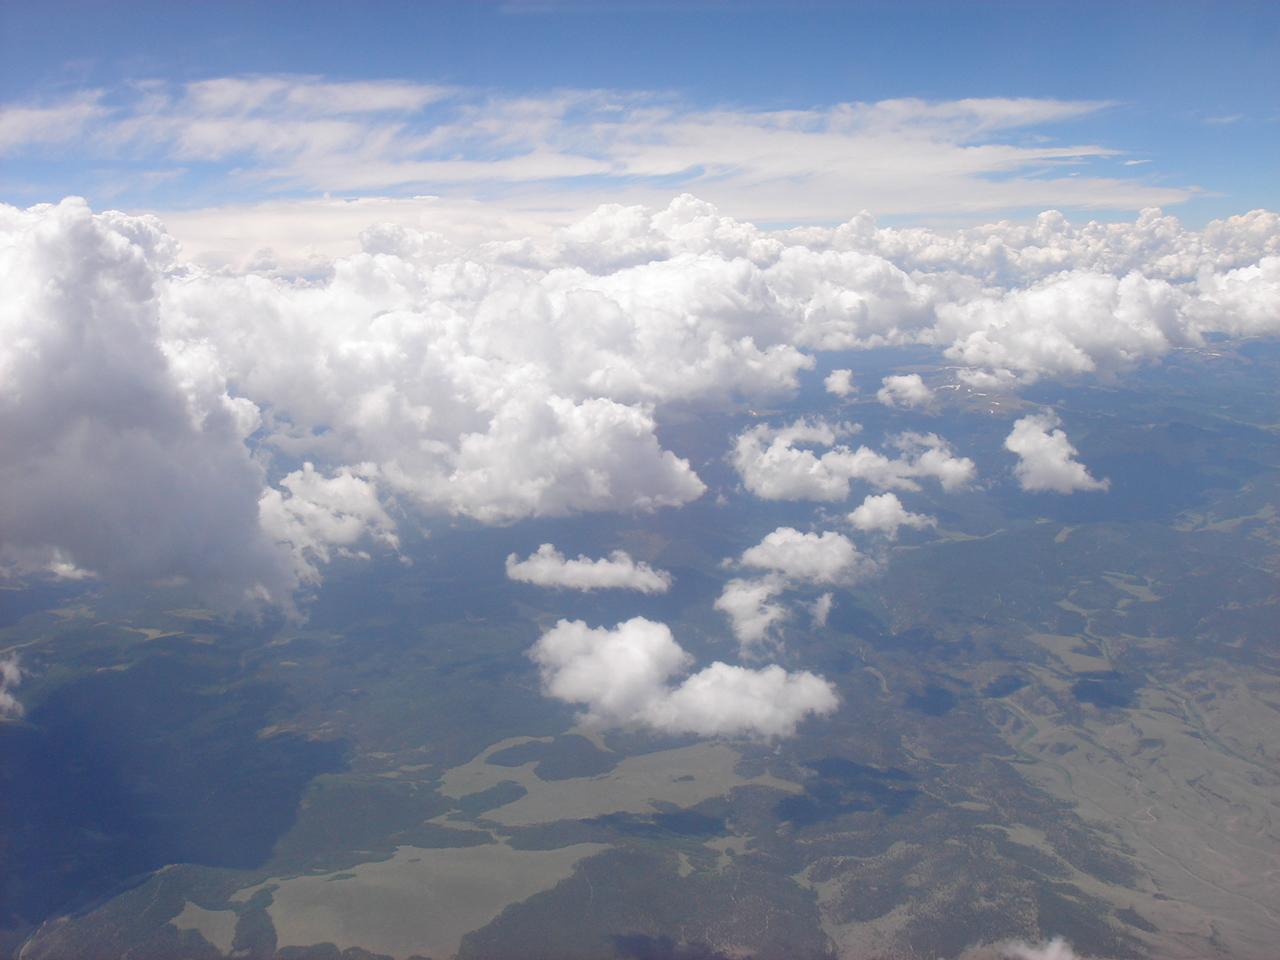 that's Colorado, methinks, far below!